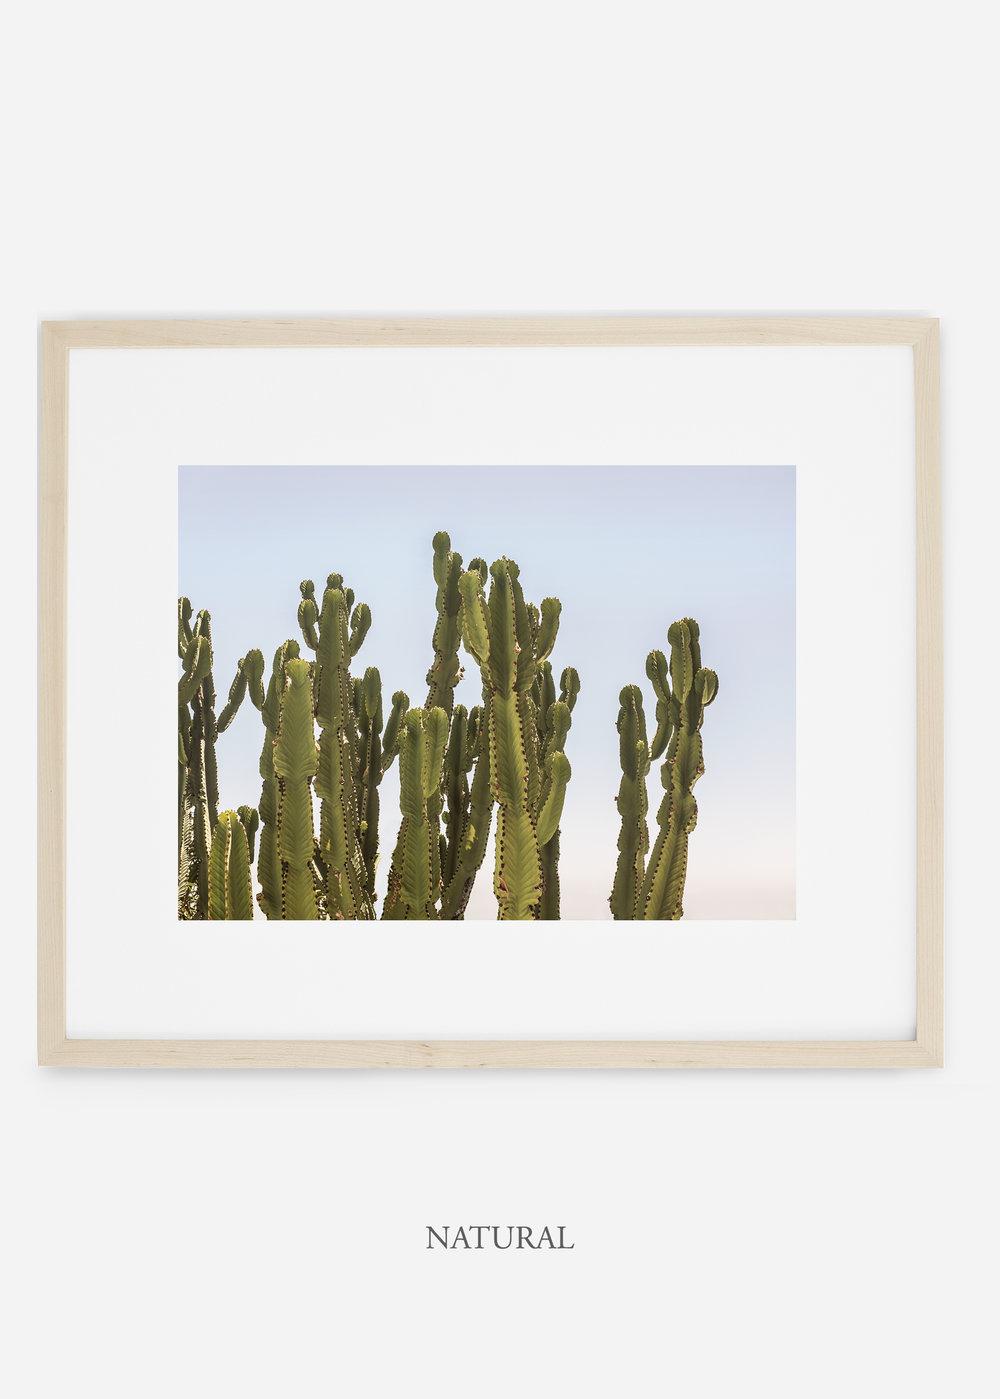 WilderCalifornia_naturalframe_interiordesign_cactusprint_CaiforniaCactusNo.3.jpg